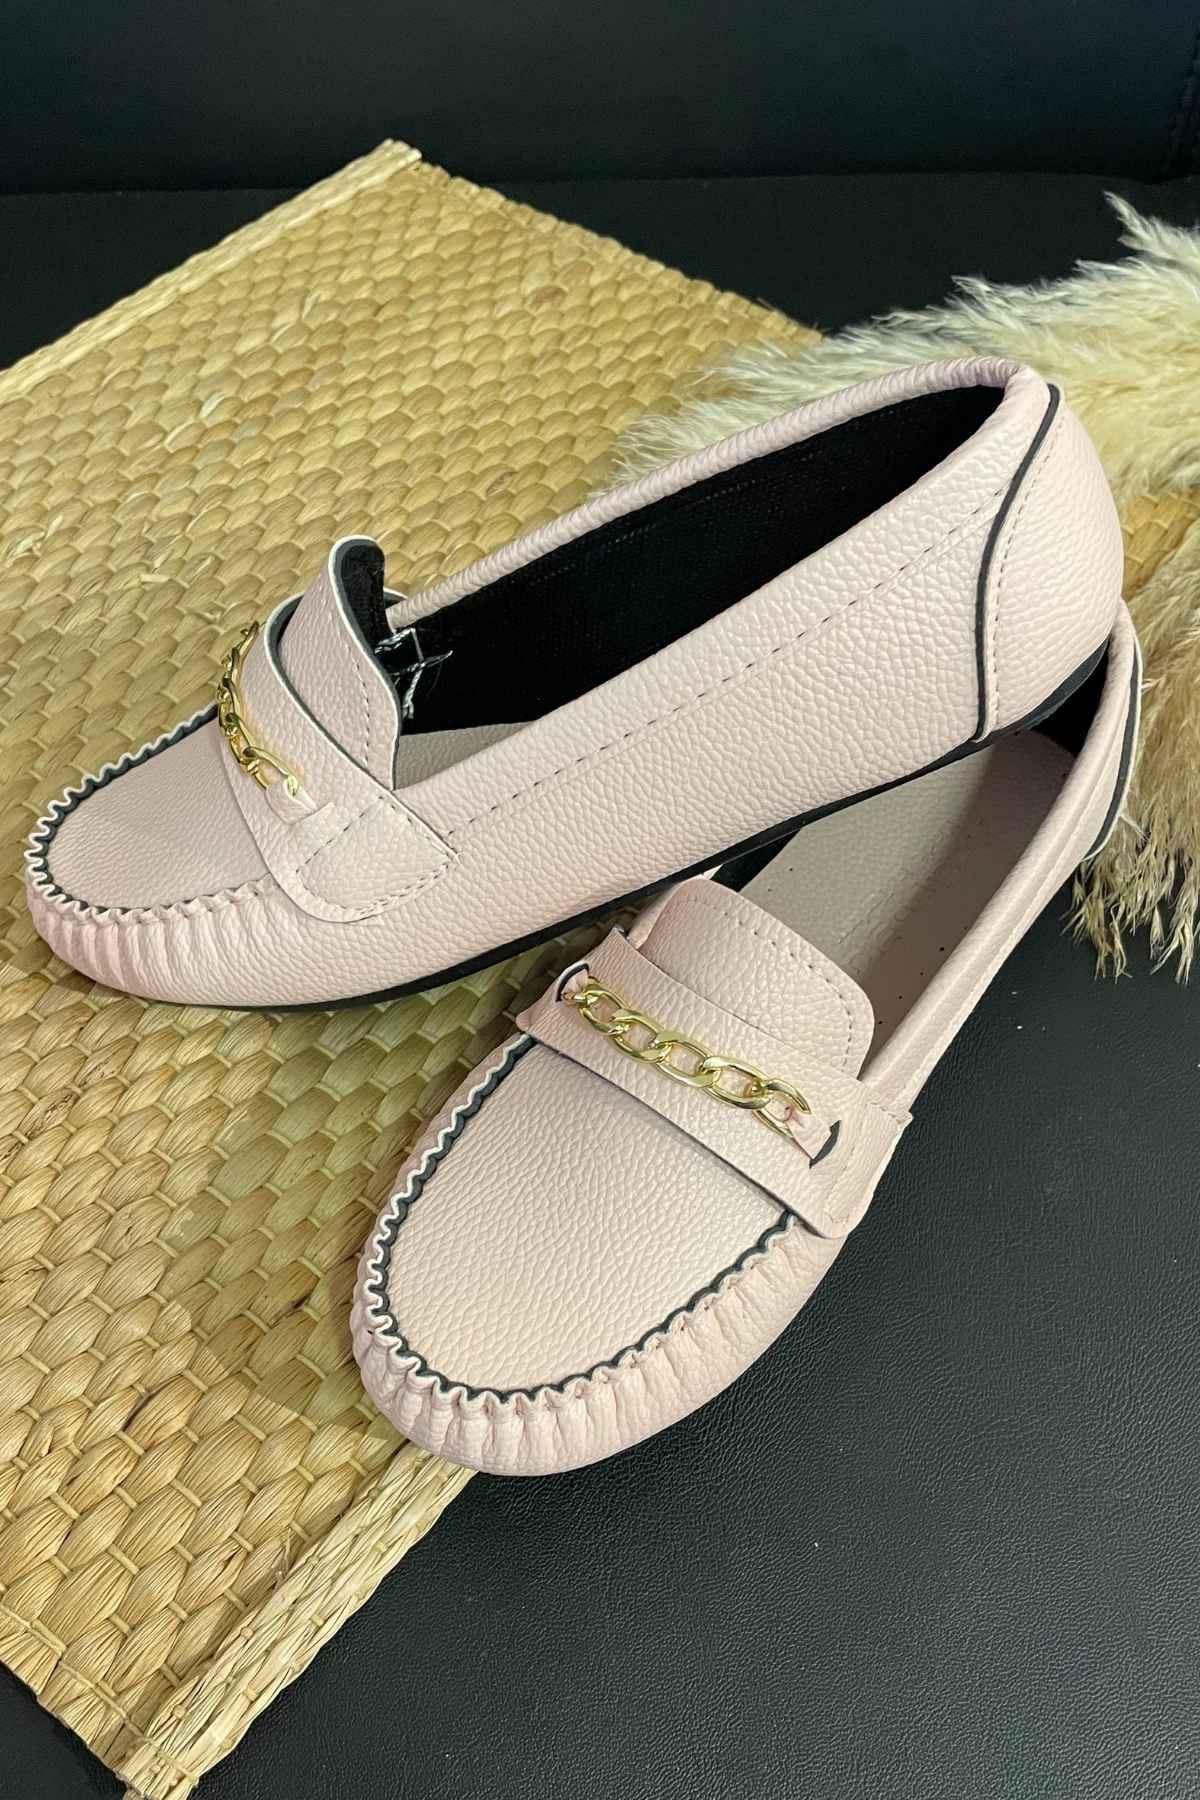 Sohi Pudra Deri Zincirli Rok Babet Ayakkabı